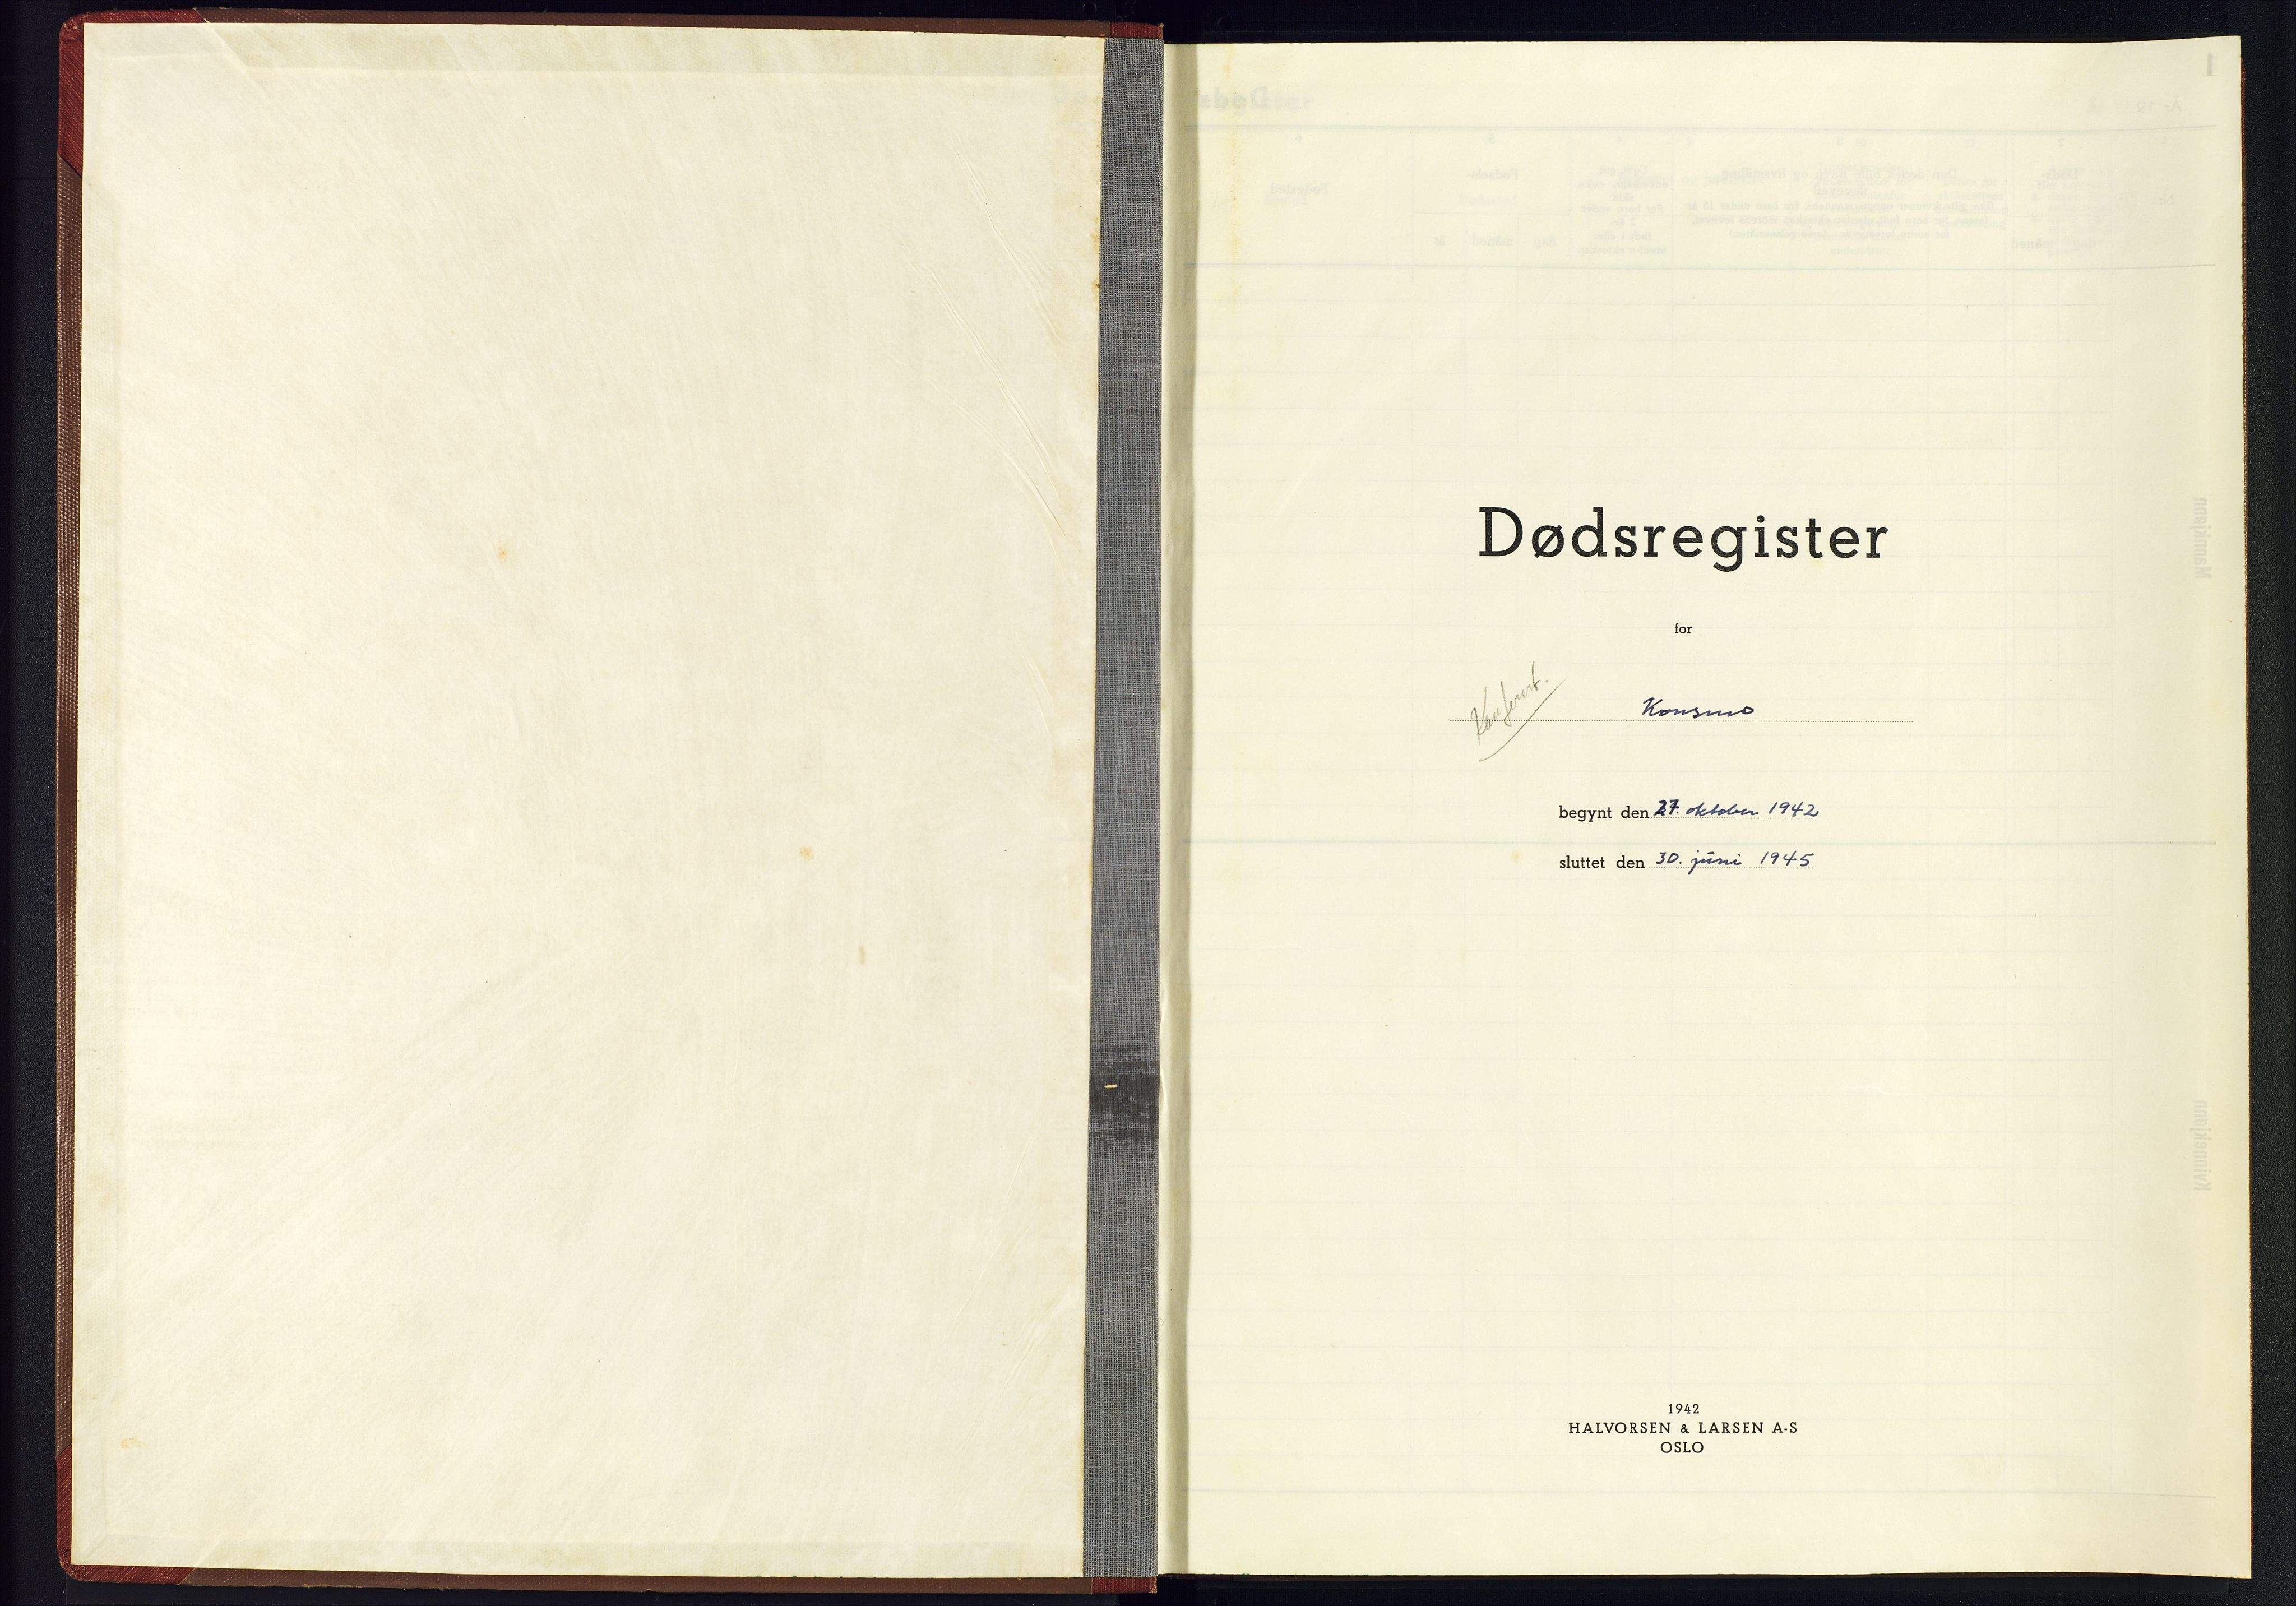 SAK, Nord-Audnedal sokneprestkontor, J/Jb/L0006: A-VI-6 - Dødsfallsregister Konsmo, 1942-1945